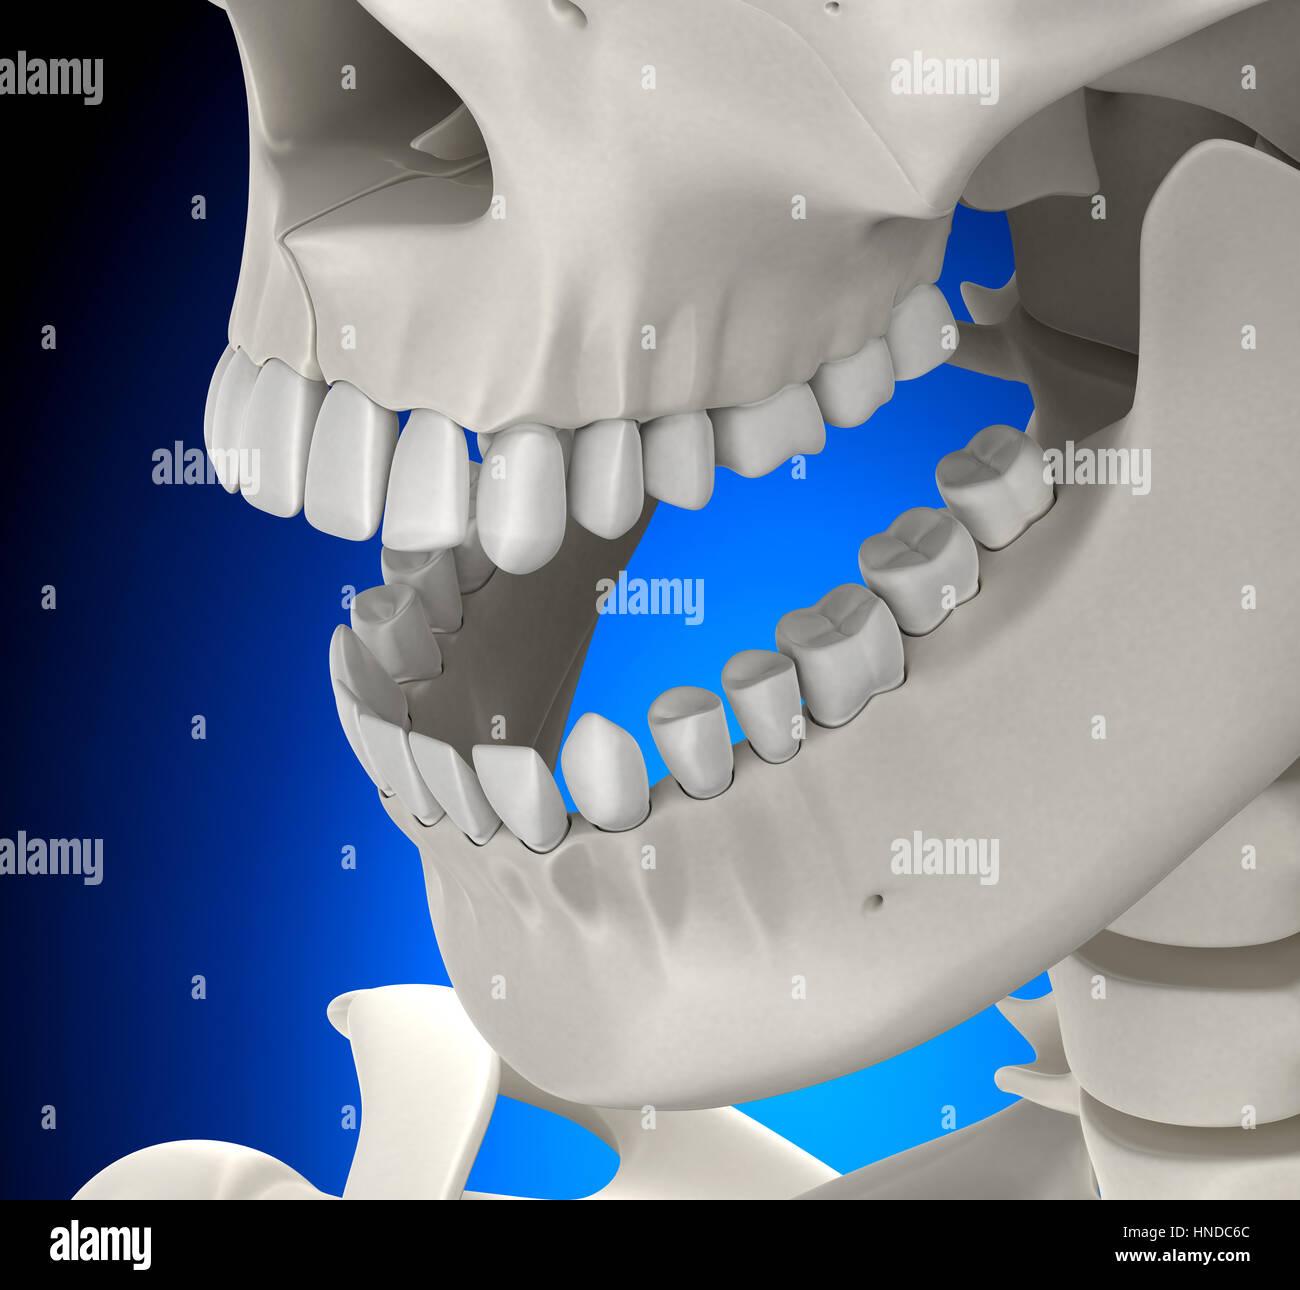 Teeth Skull Male Anatomy on blue background - 3D illustration Stock ...